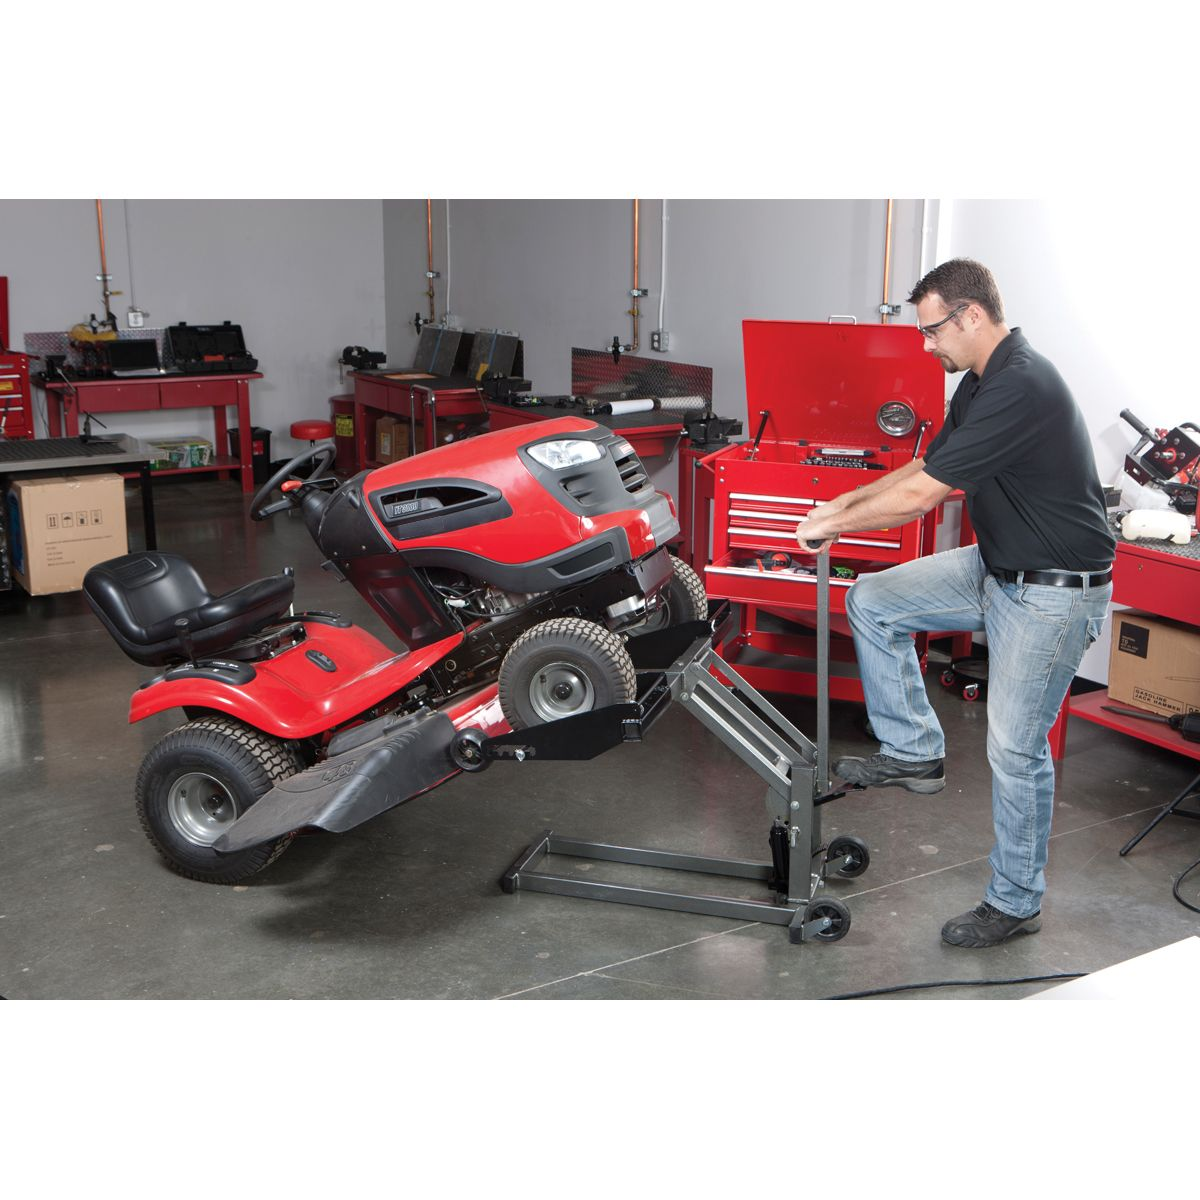 300 Lb Atv Lawn Mower Lift In 2019 Riding Lawn Mowers